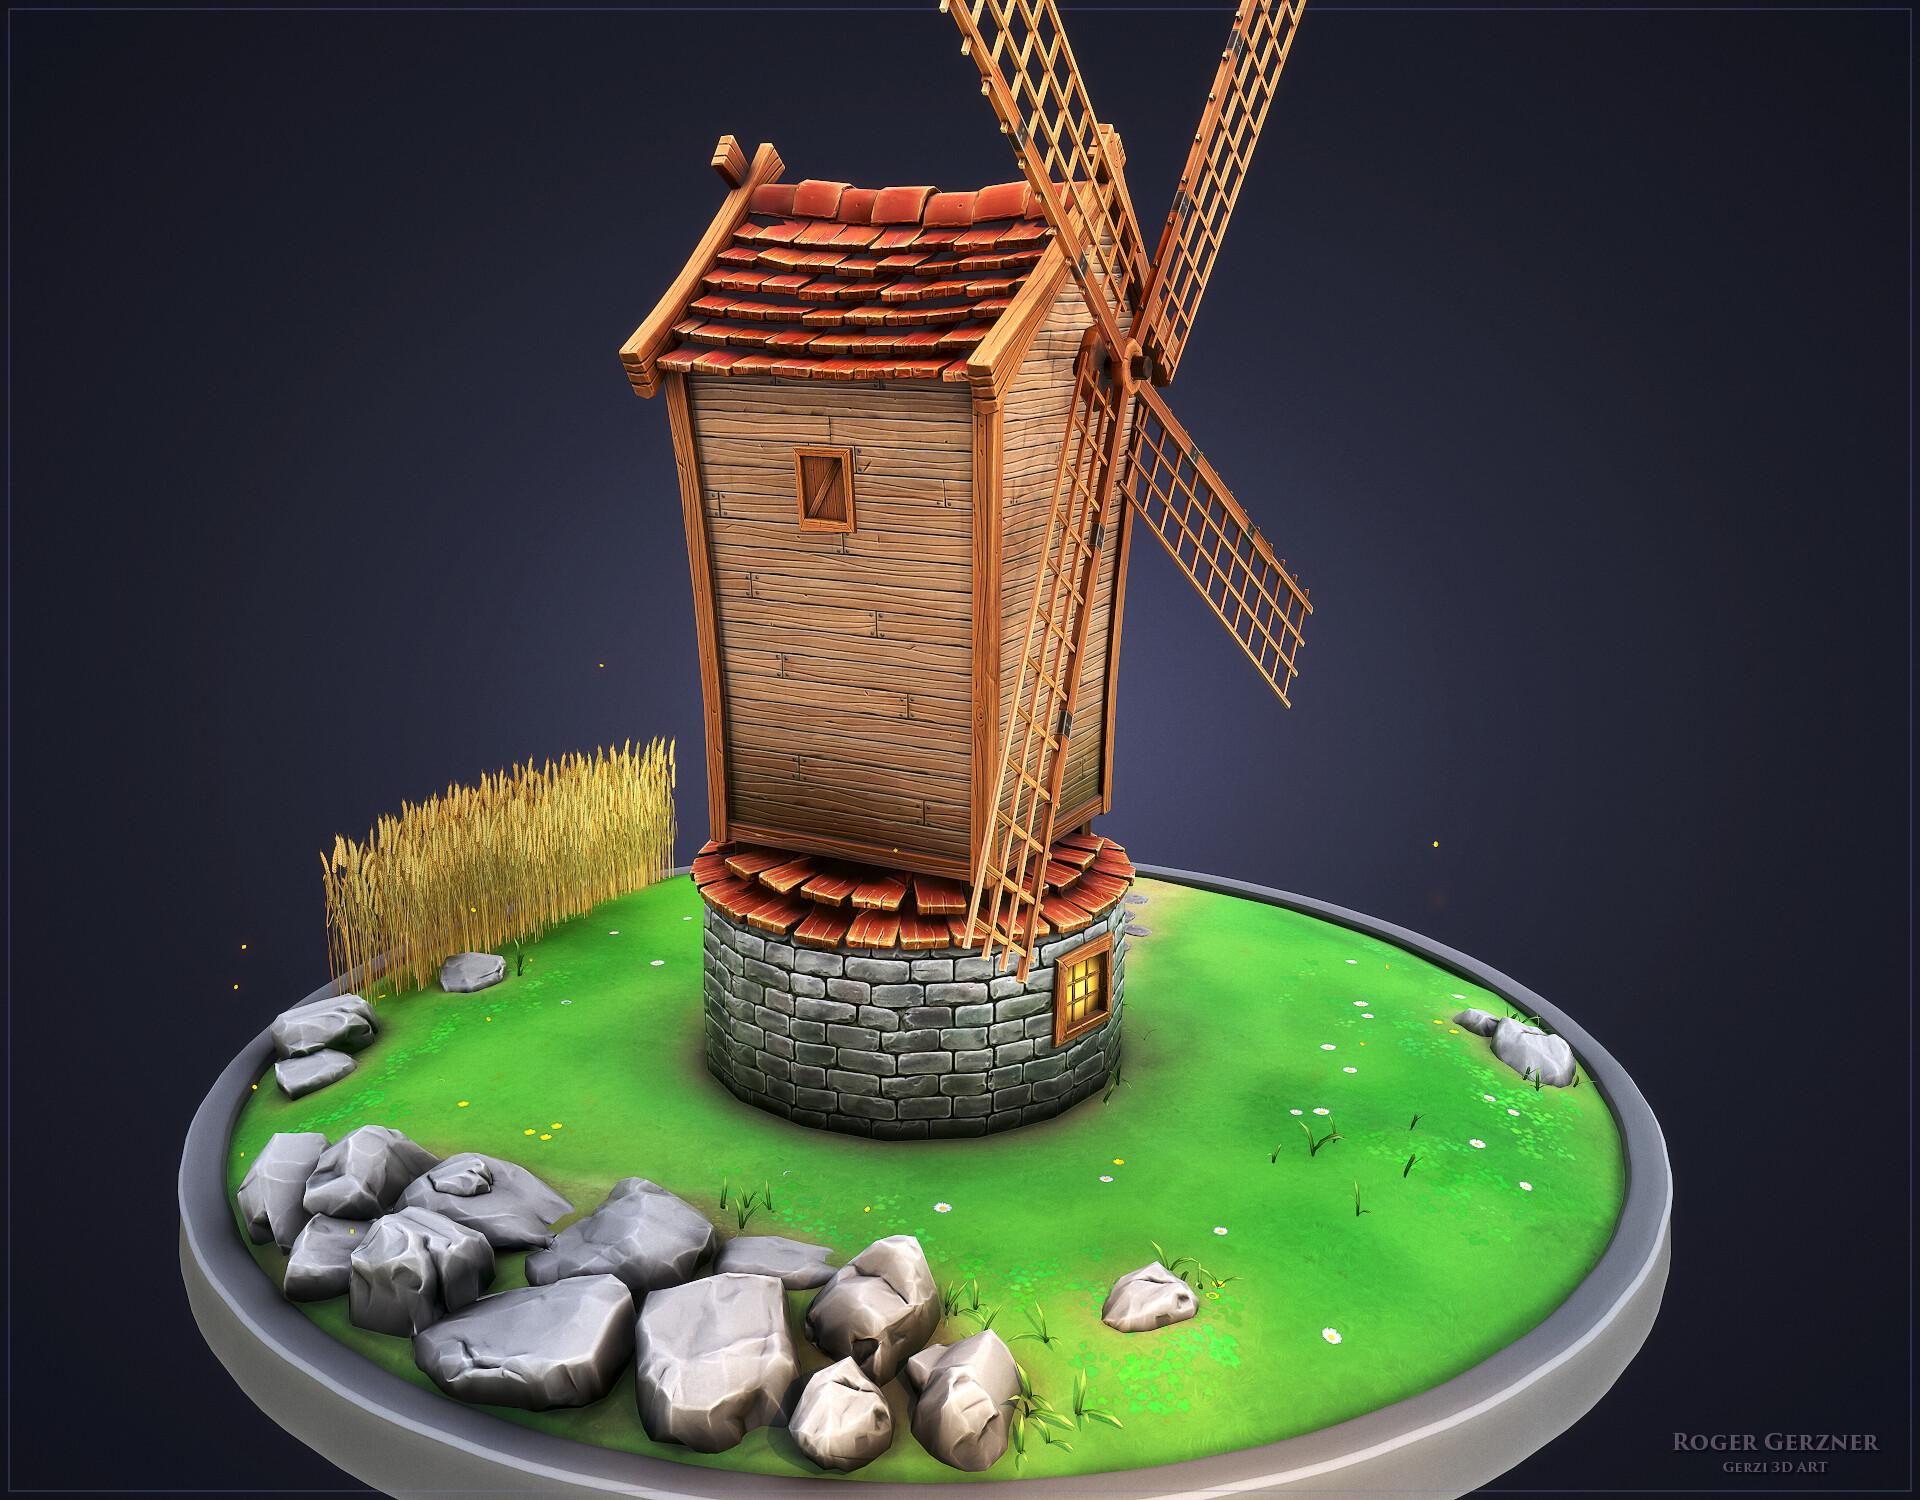 Roger gerzner rogergerzner windmill 01c